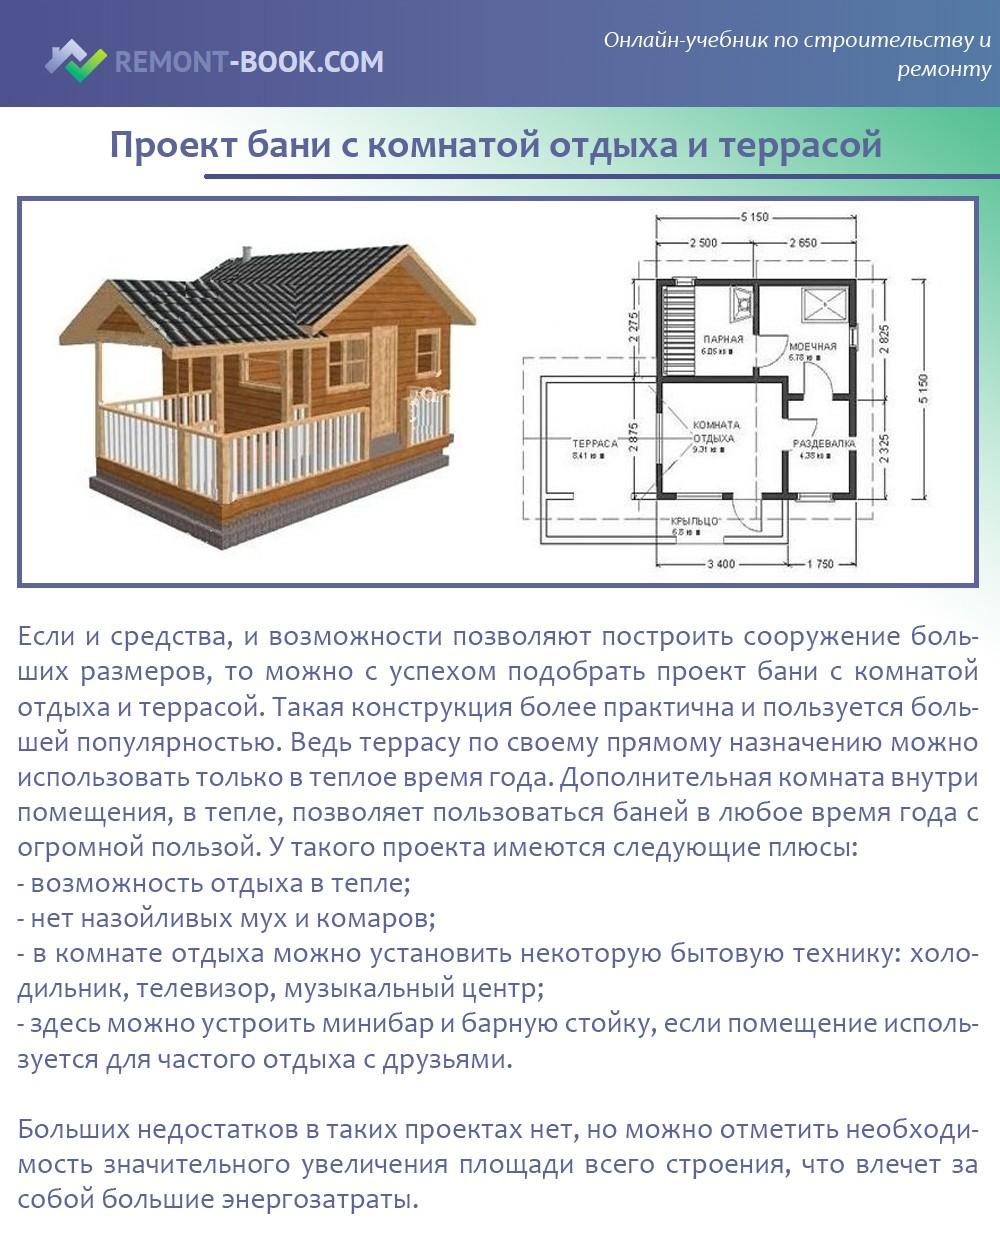 Баня площадью 3 на 4 - планировка внутри (57 фото): конструкций метражом 3х4